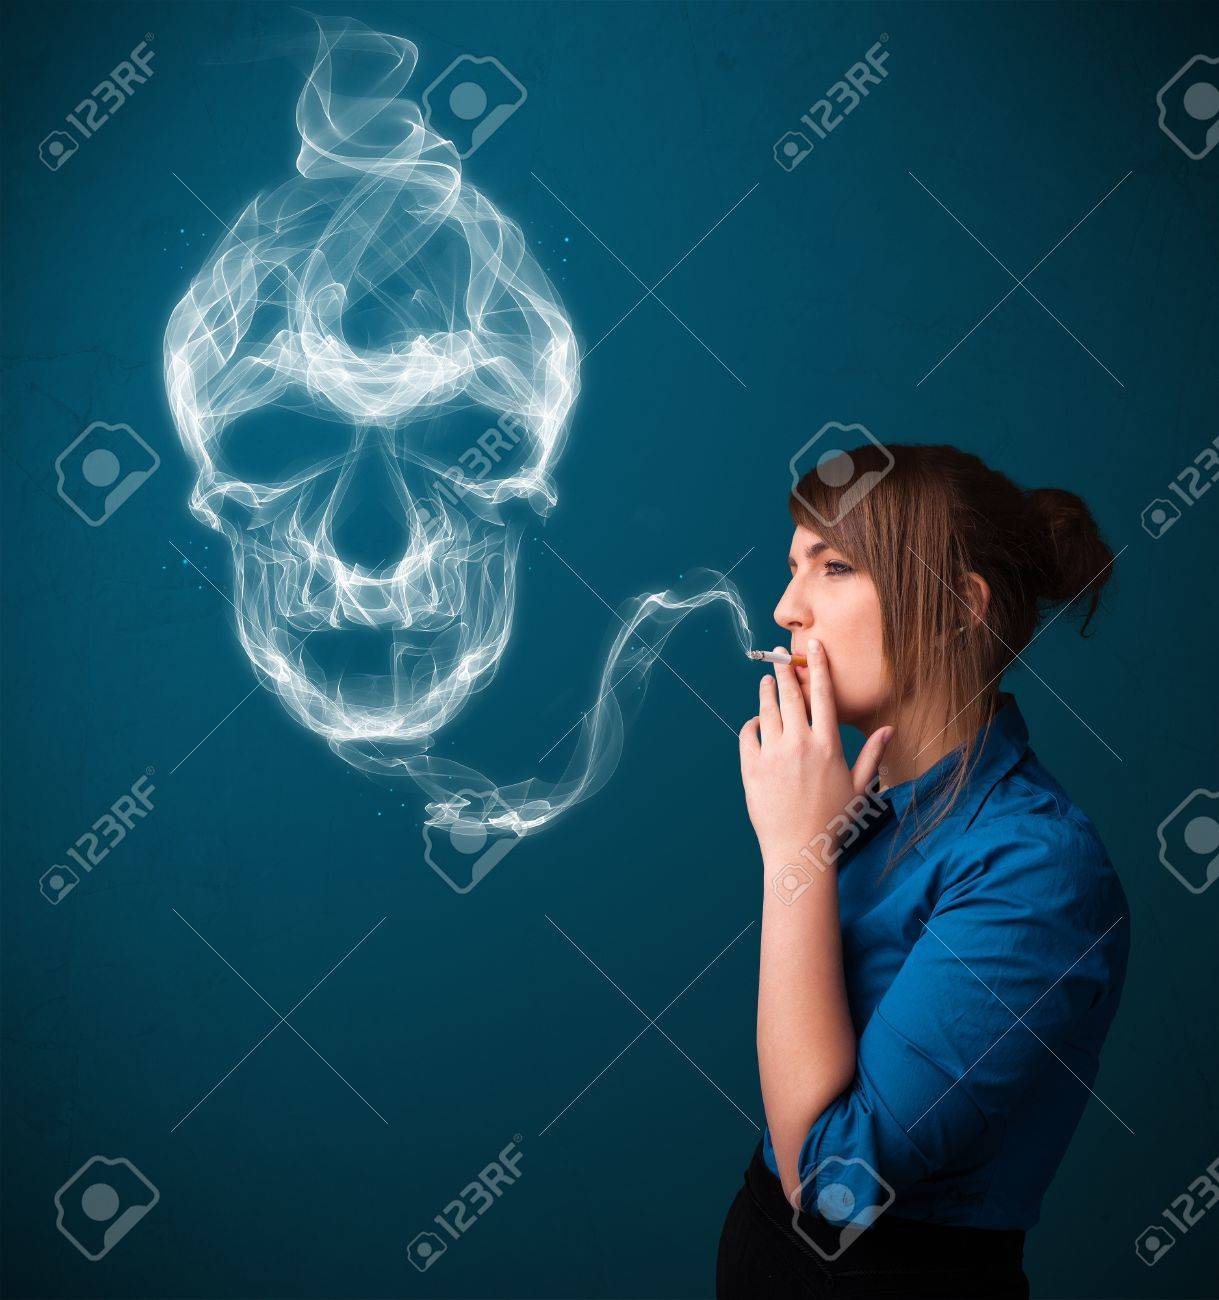 Pretty young woman smoking dangerous cigarette with toxic skull smoke Stock Photo - 16747295